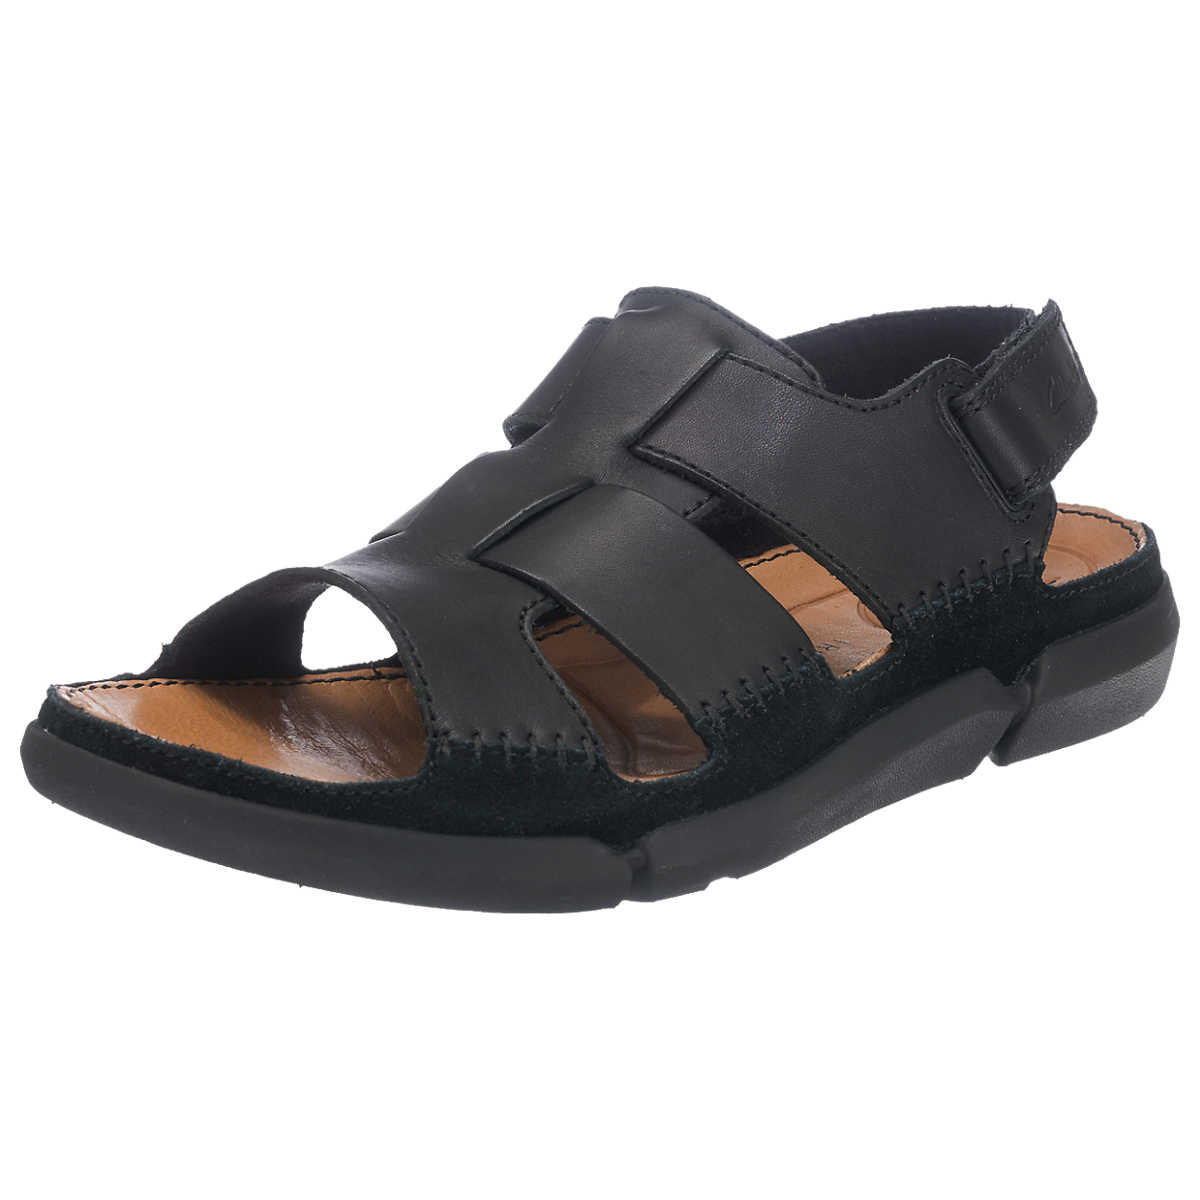 Clarks Trisand Bay Sandalen schwarz - Clarks - Sandalen - Schuhe - mirapodo.de